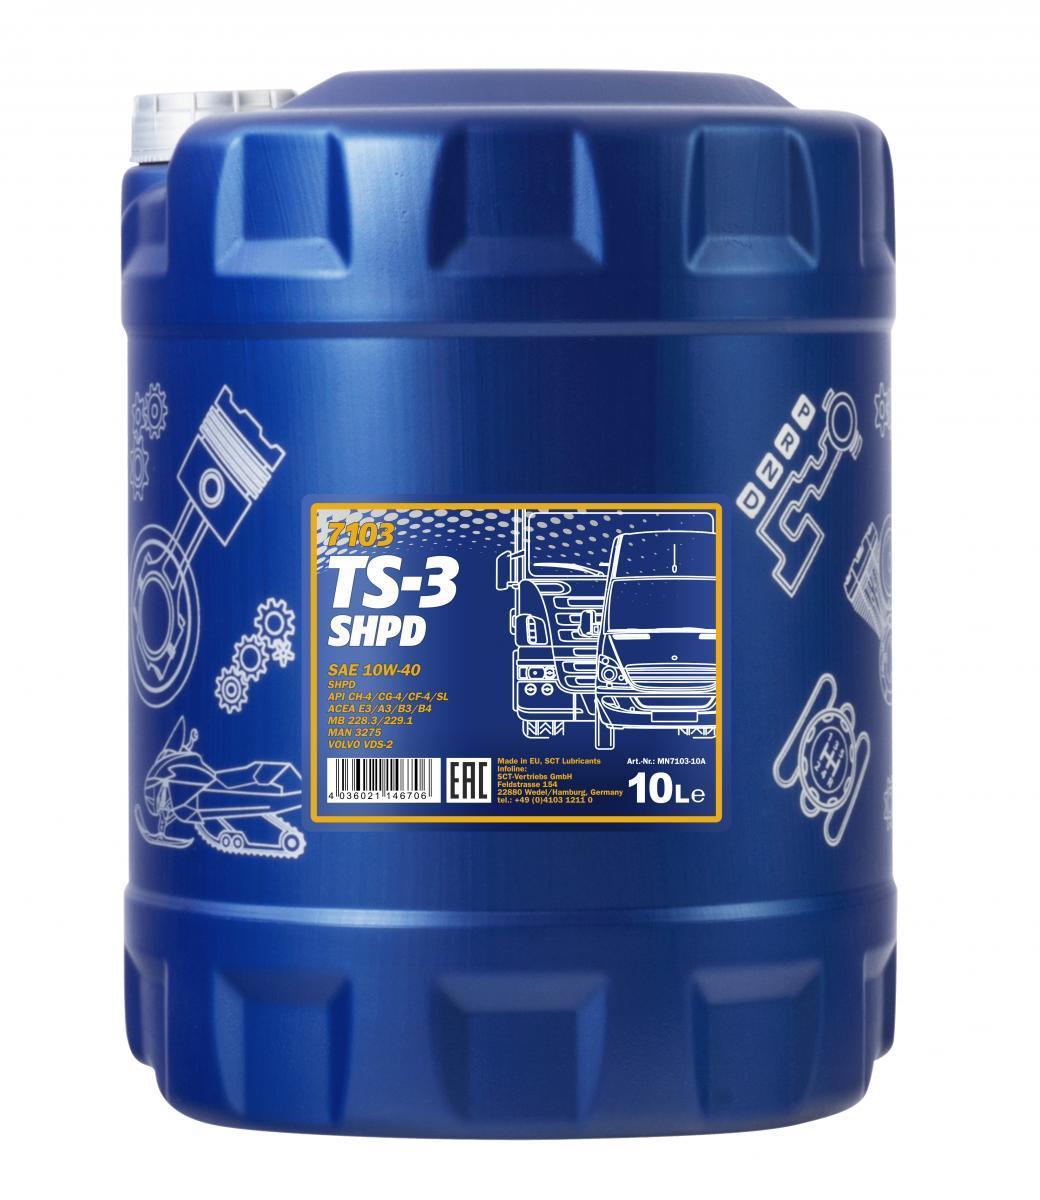 MN7103-10 MANNOL TS-3, SHPD 10W-40, 10l Motoröl MN7103-10 günstig kaufen